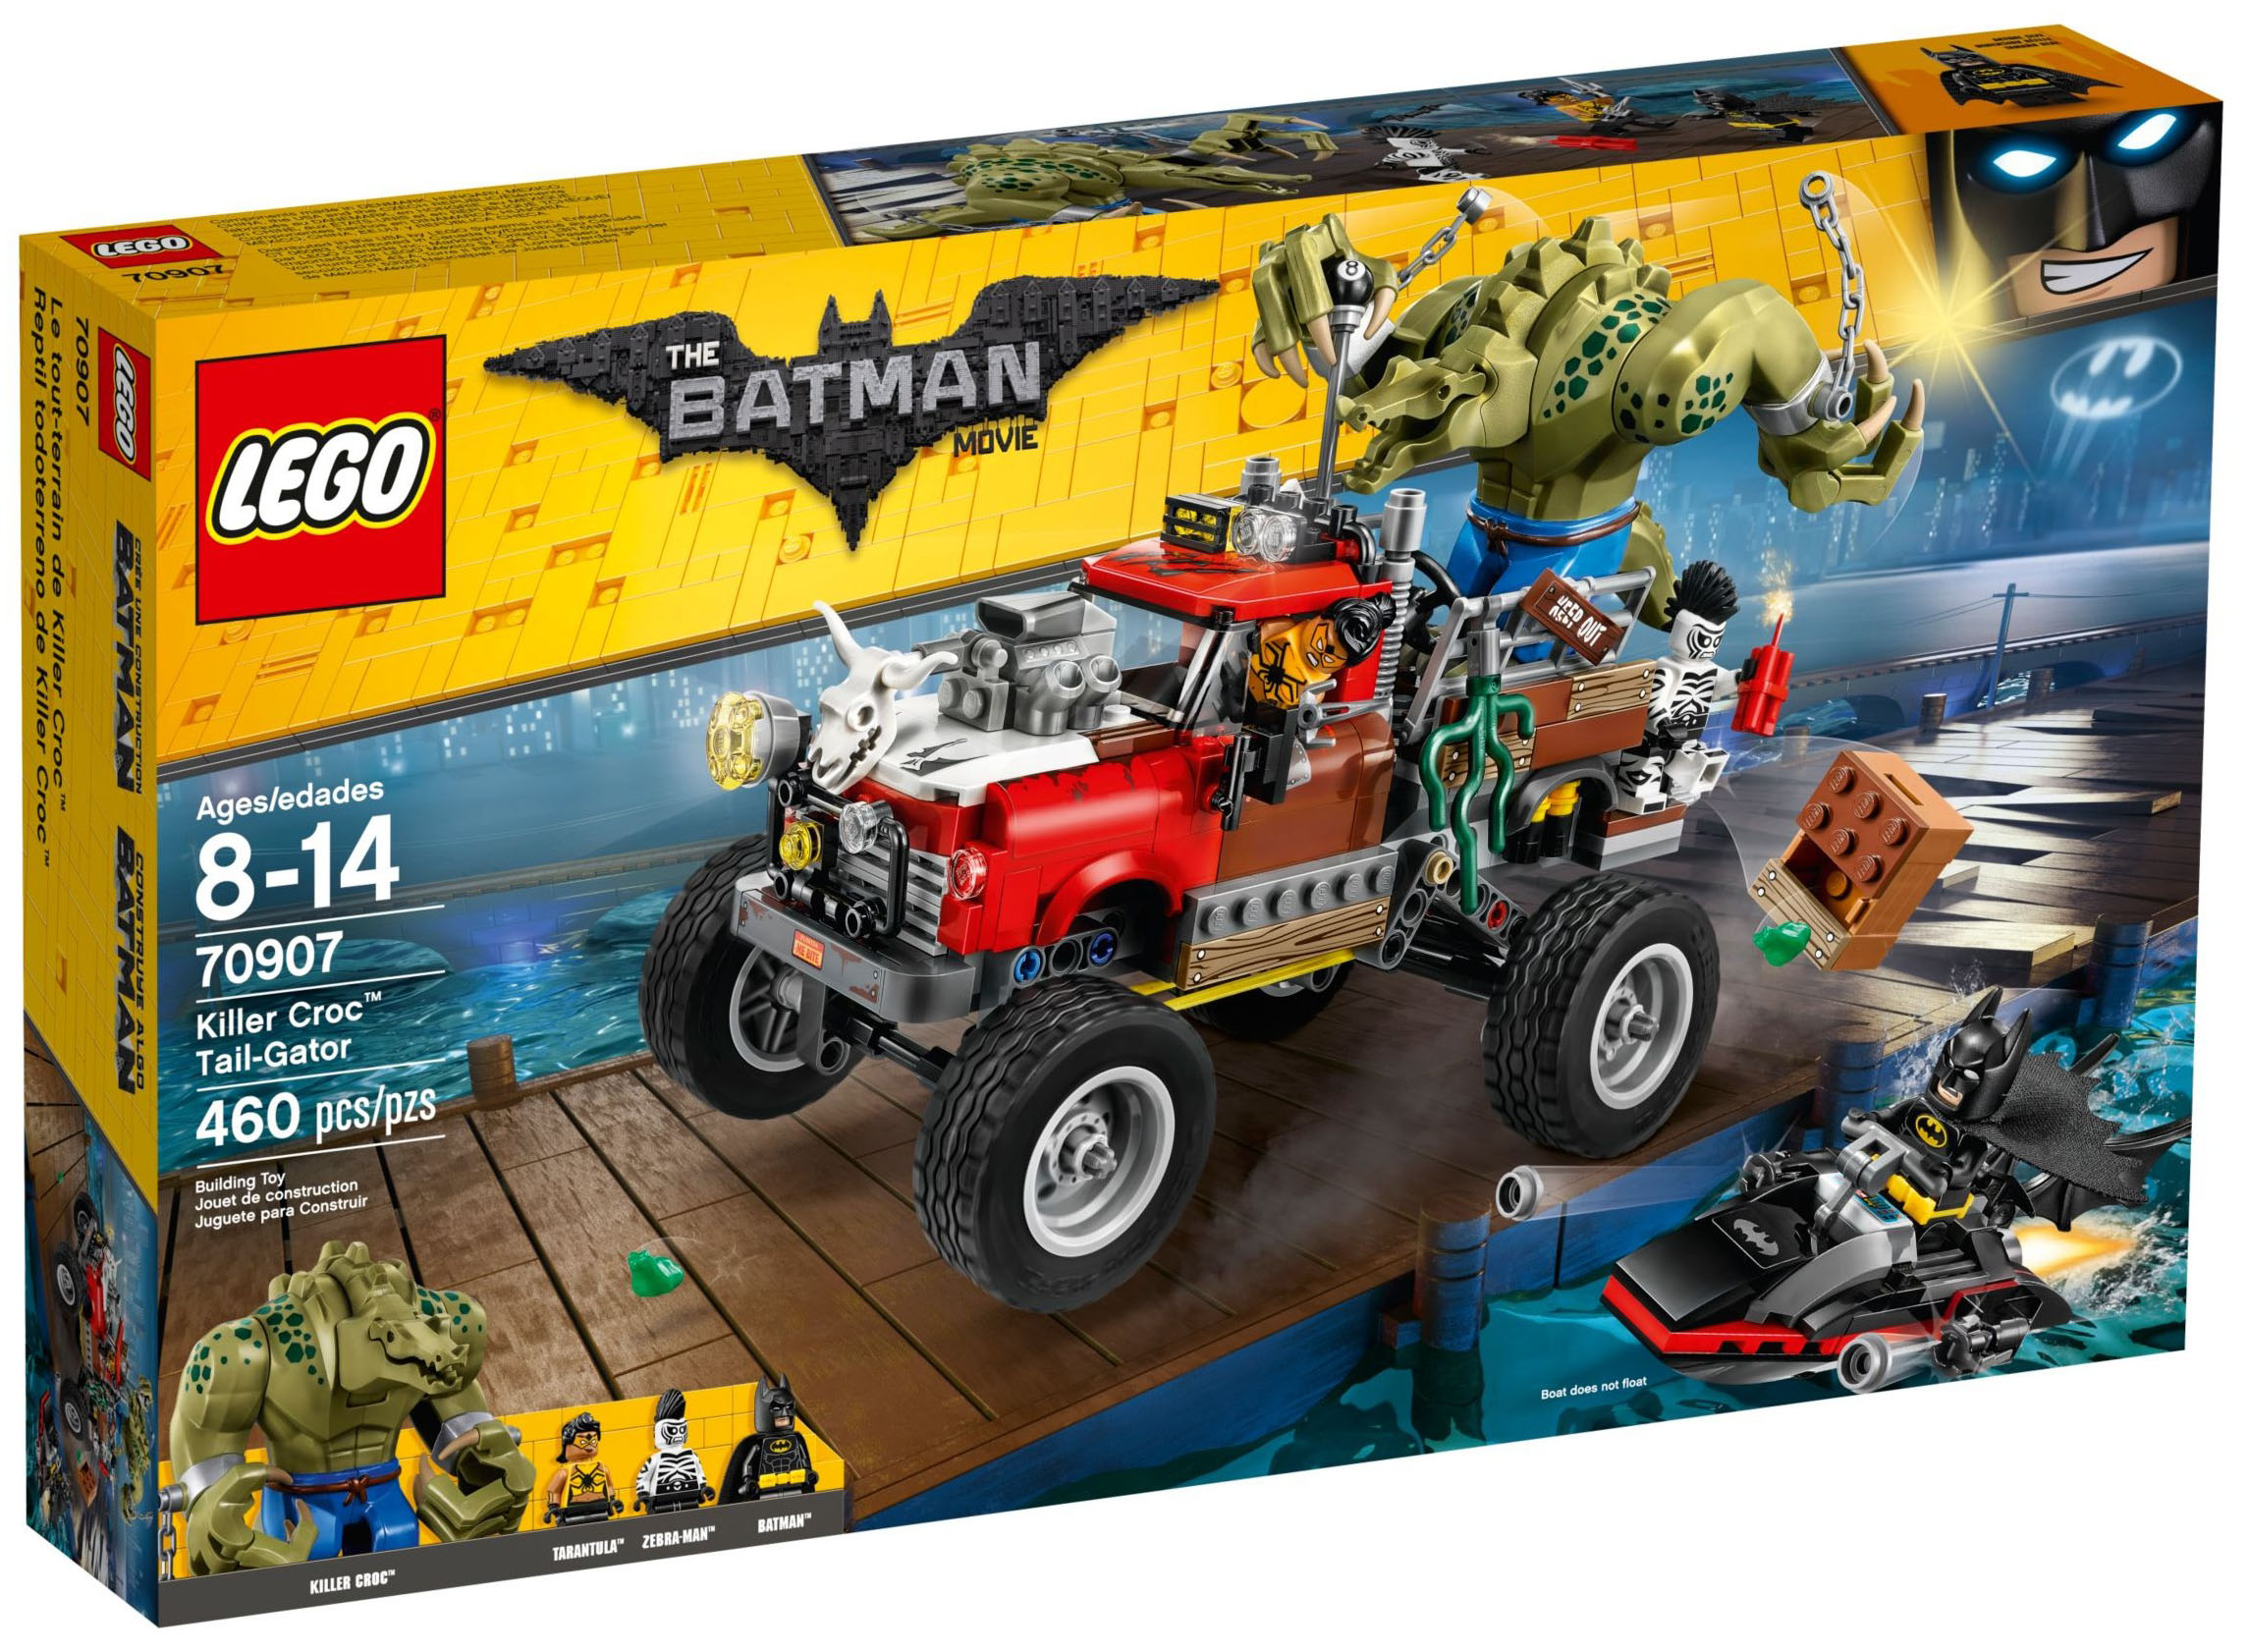 Terrain The Batman 70907 Lego Tout Croc Killer Movie De Le v80wmnN